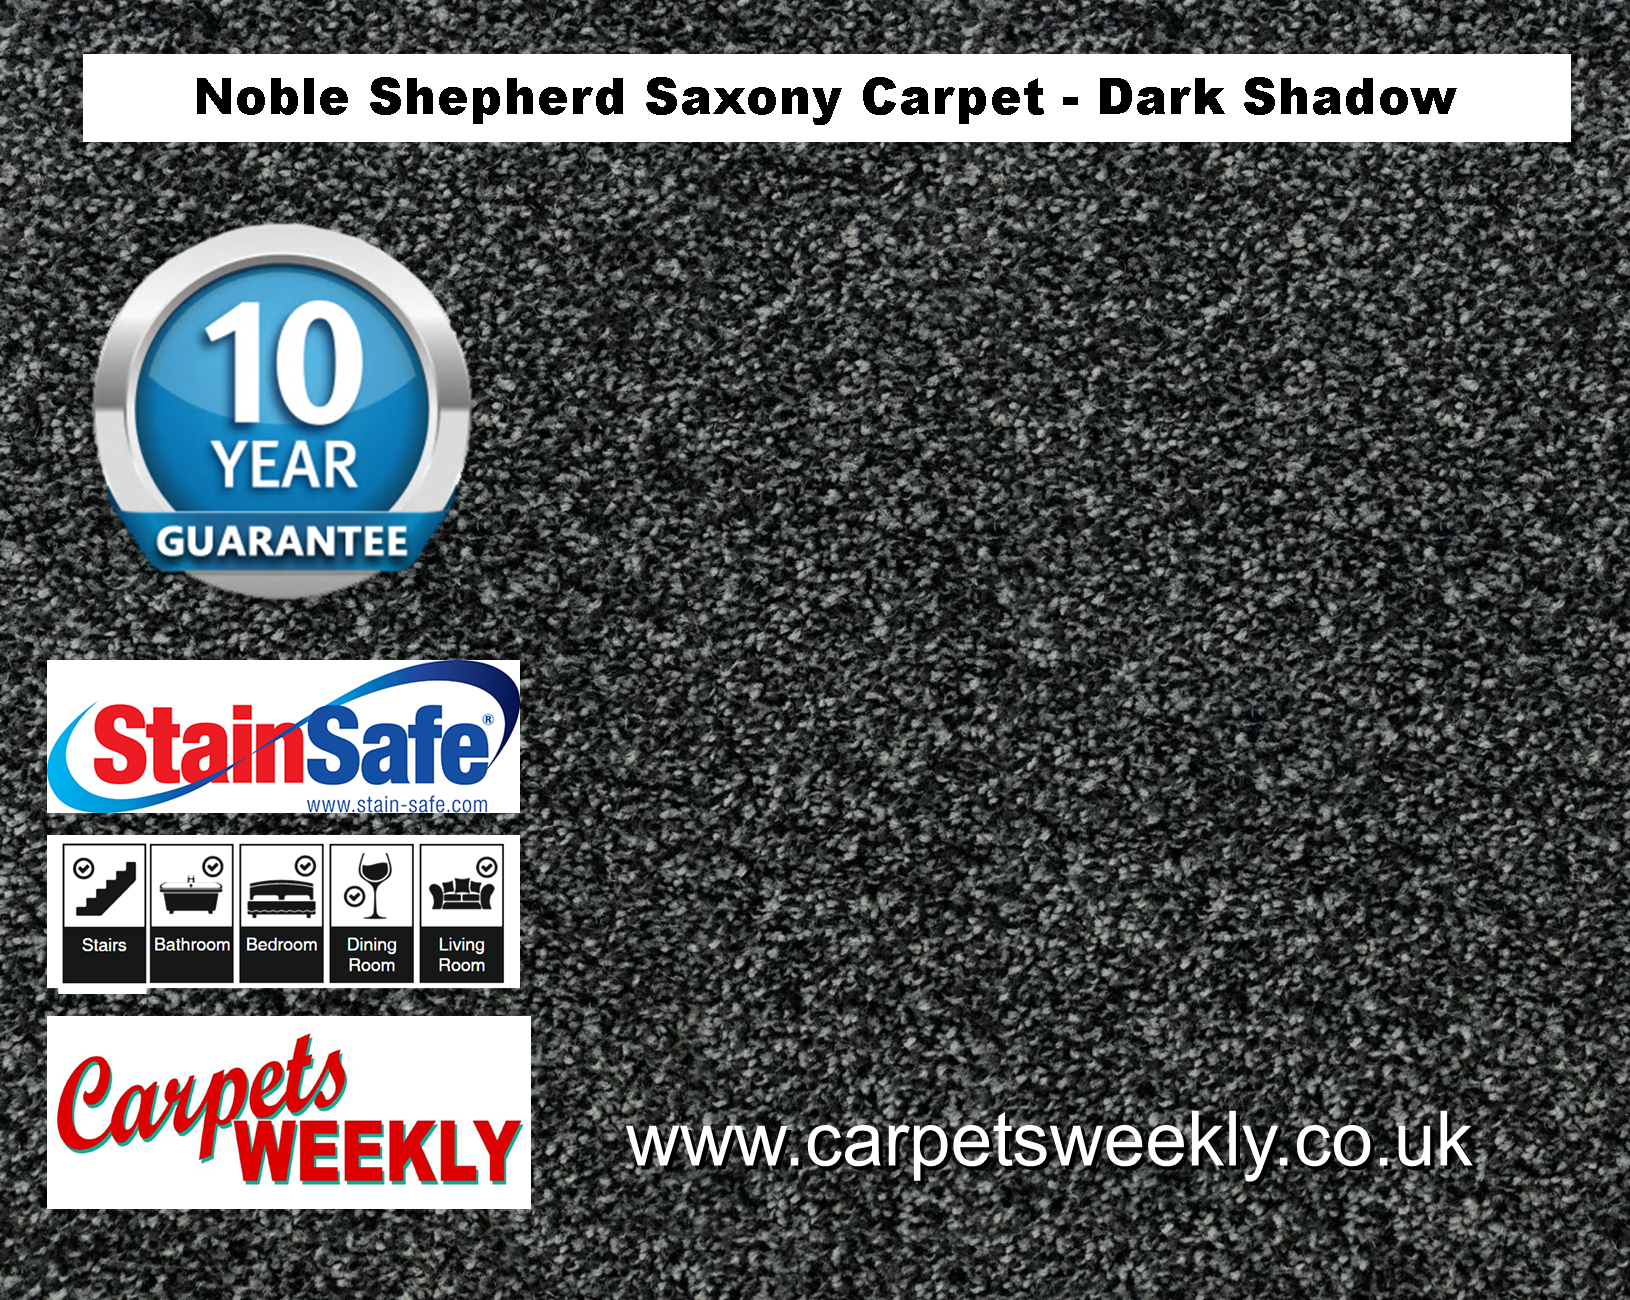 Noble Shepherd Saxony Carpet from Carpets Weekly Noble Shepherd Saxony Carpet from Carpets Weekly Darker Shadow (990)